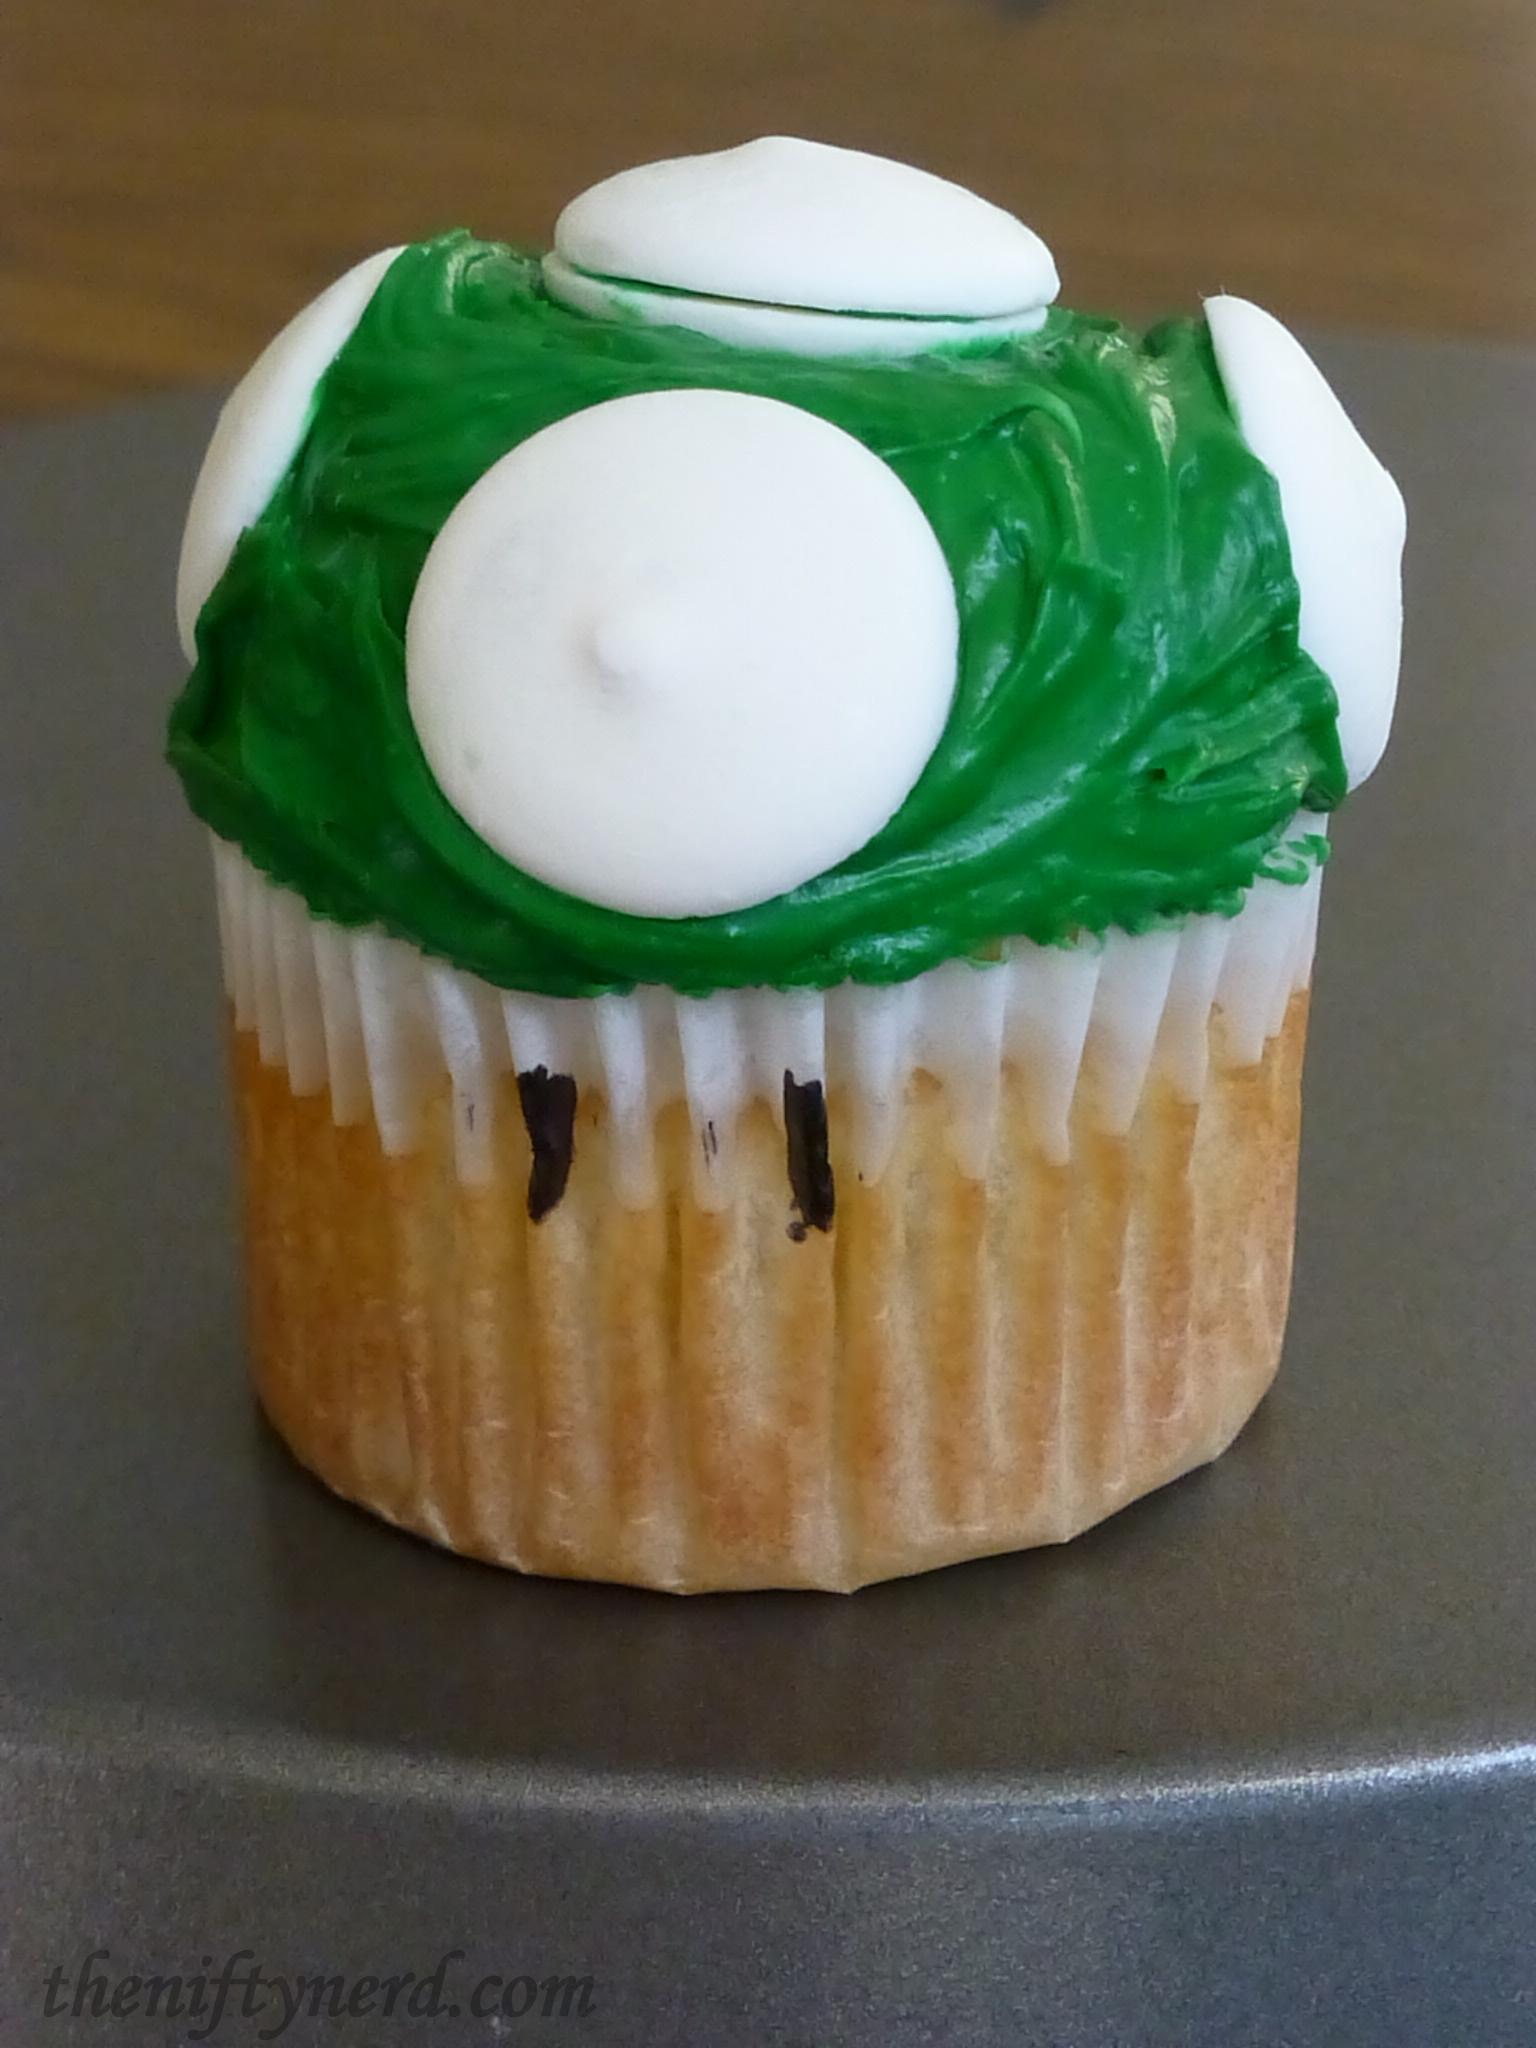 green 1UP Mario mushroom cupcake